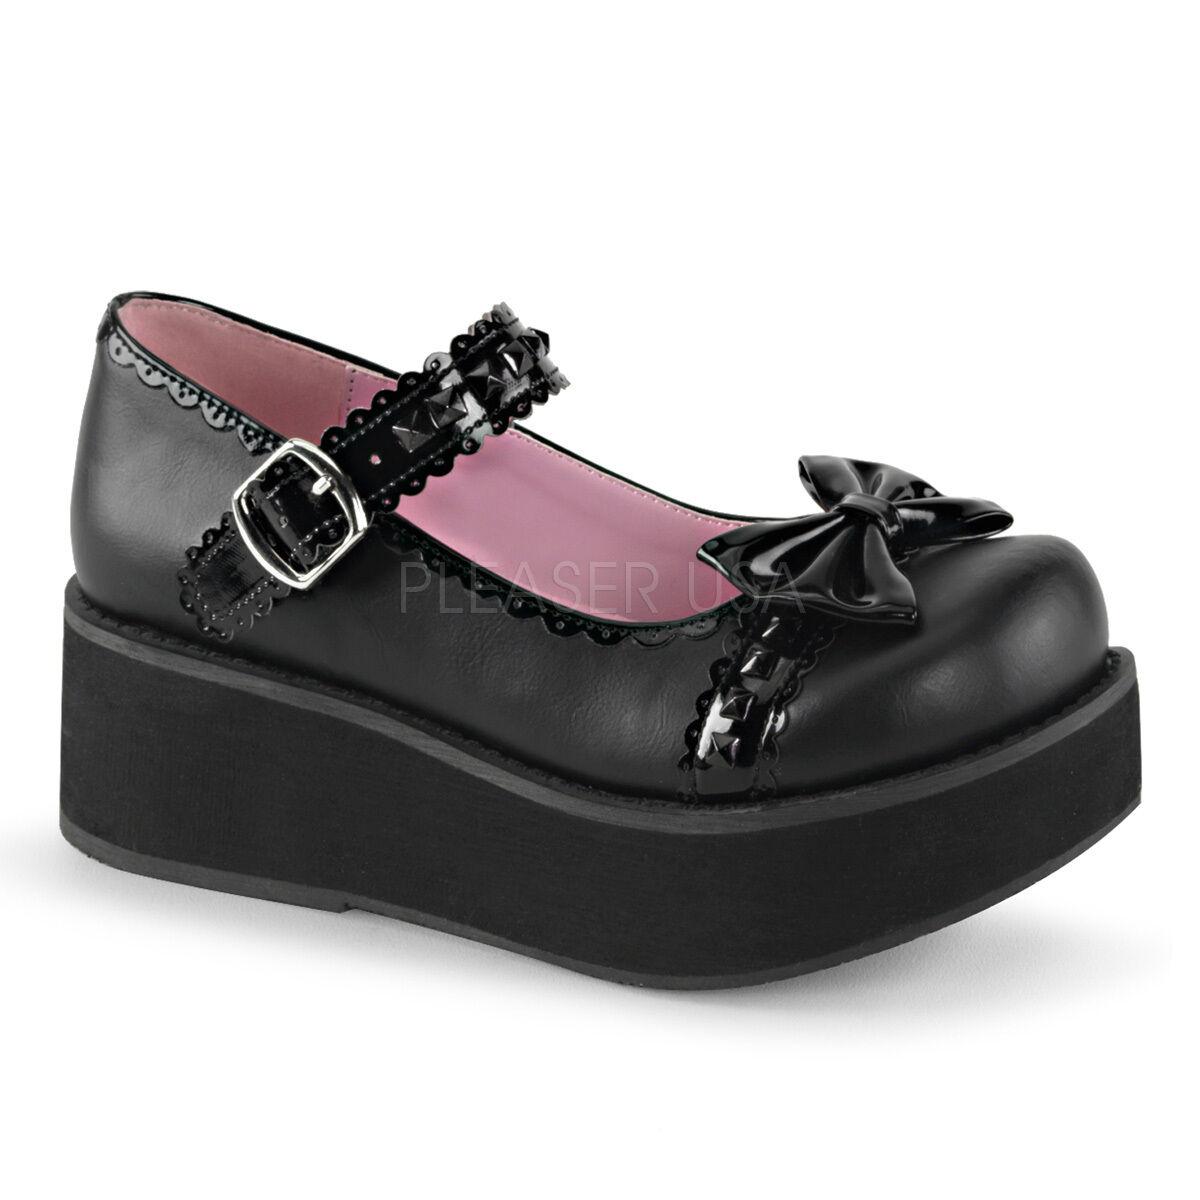 DEMONIA Gothic Lolita 2 1 4  Platform Studded Black Mary Janes shoes